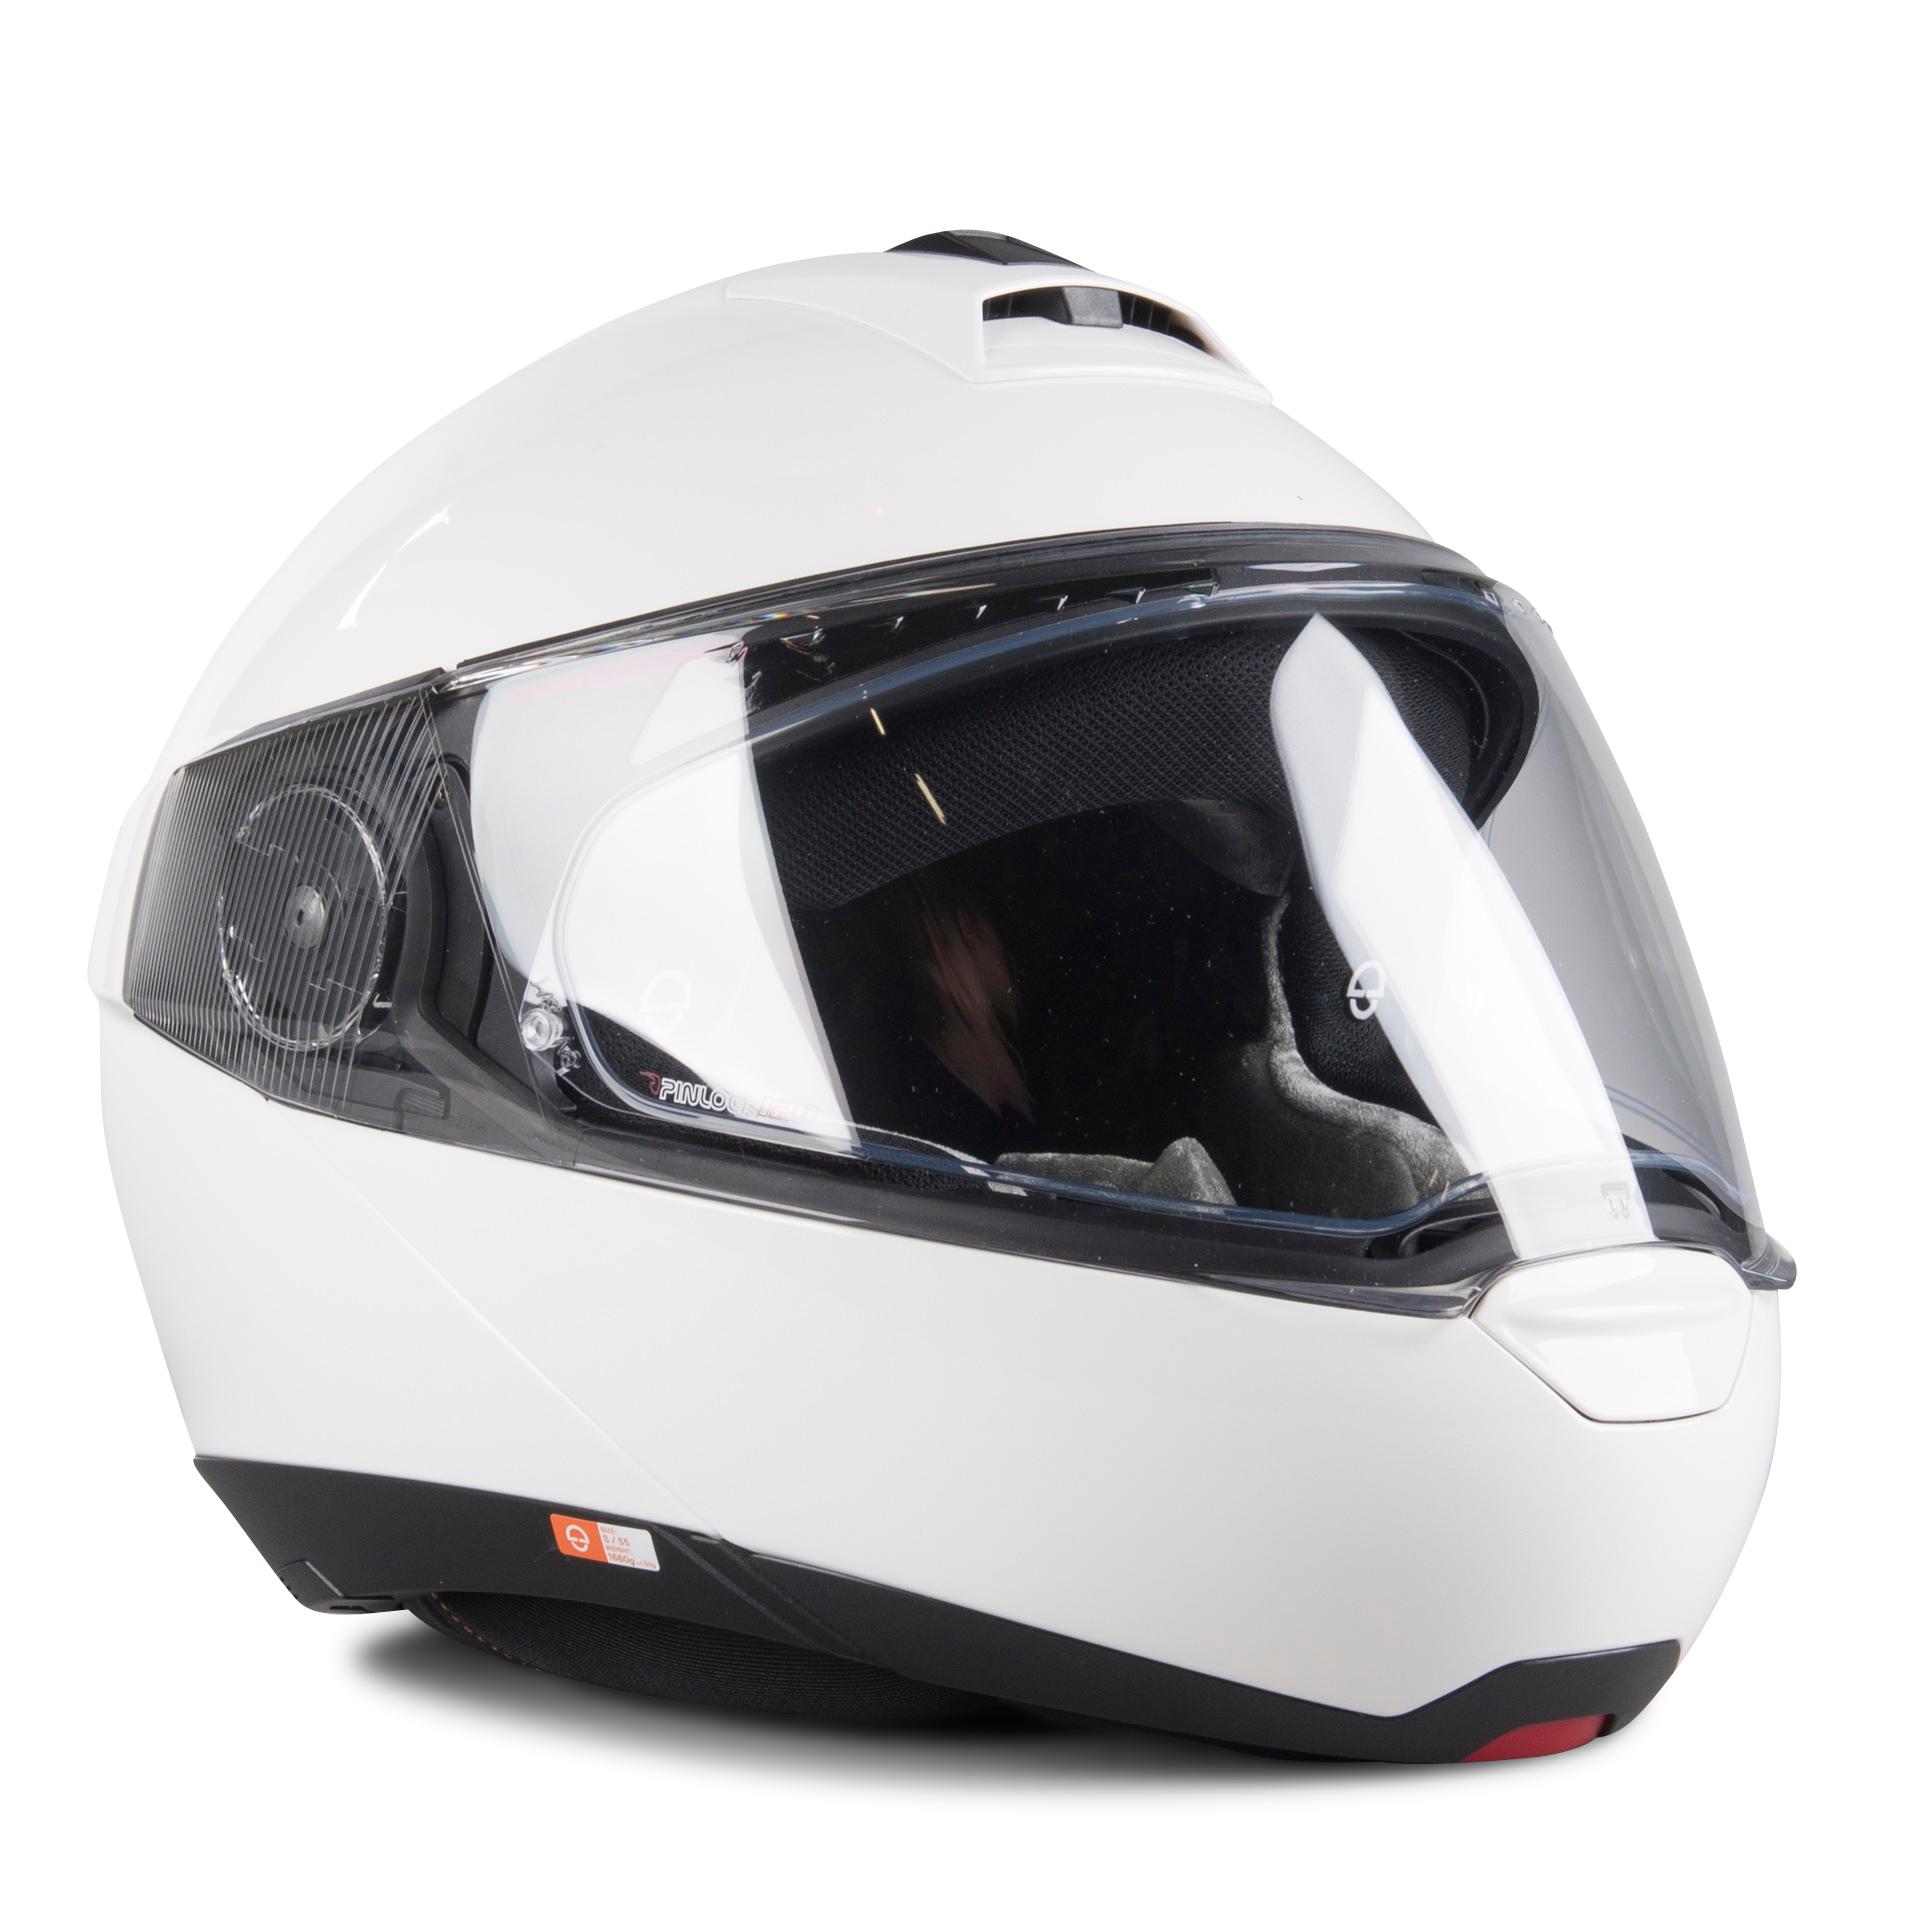 Schuberth Casco Modulare C4 Pro Bianco